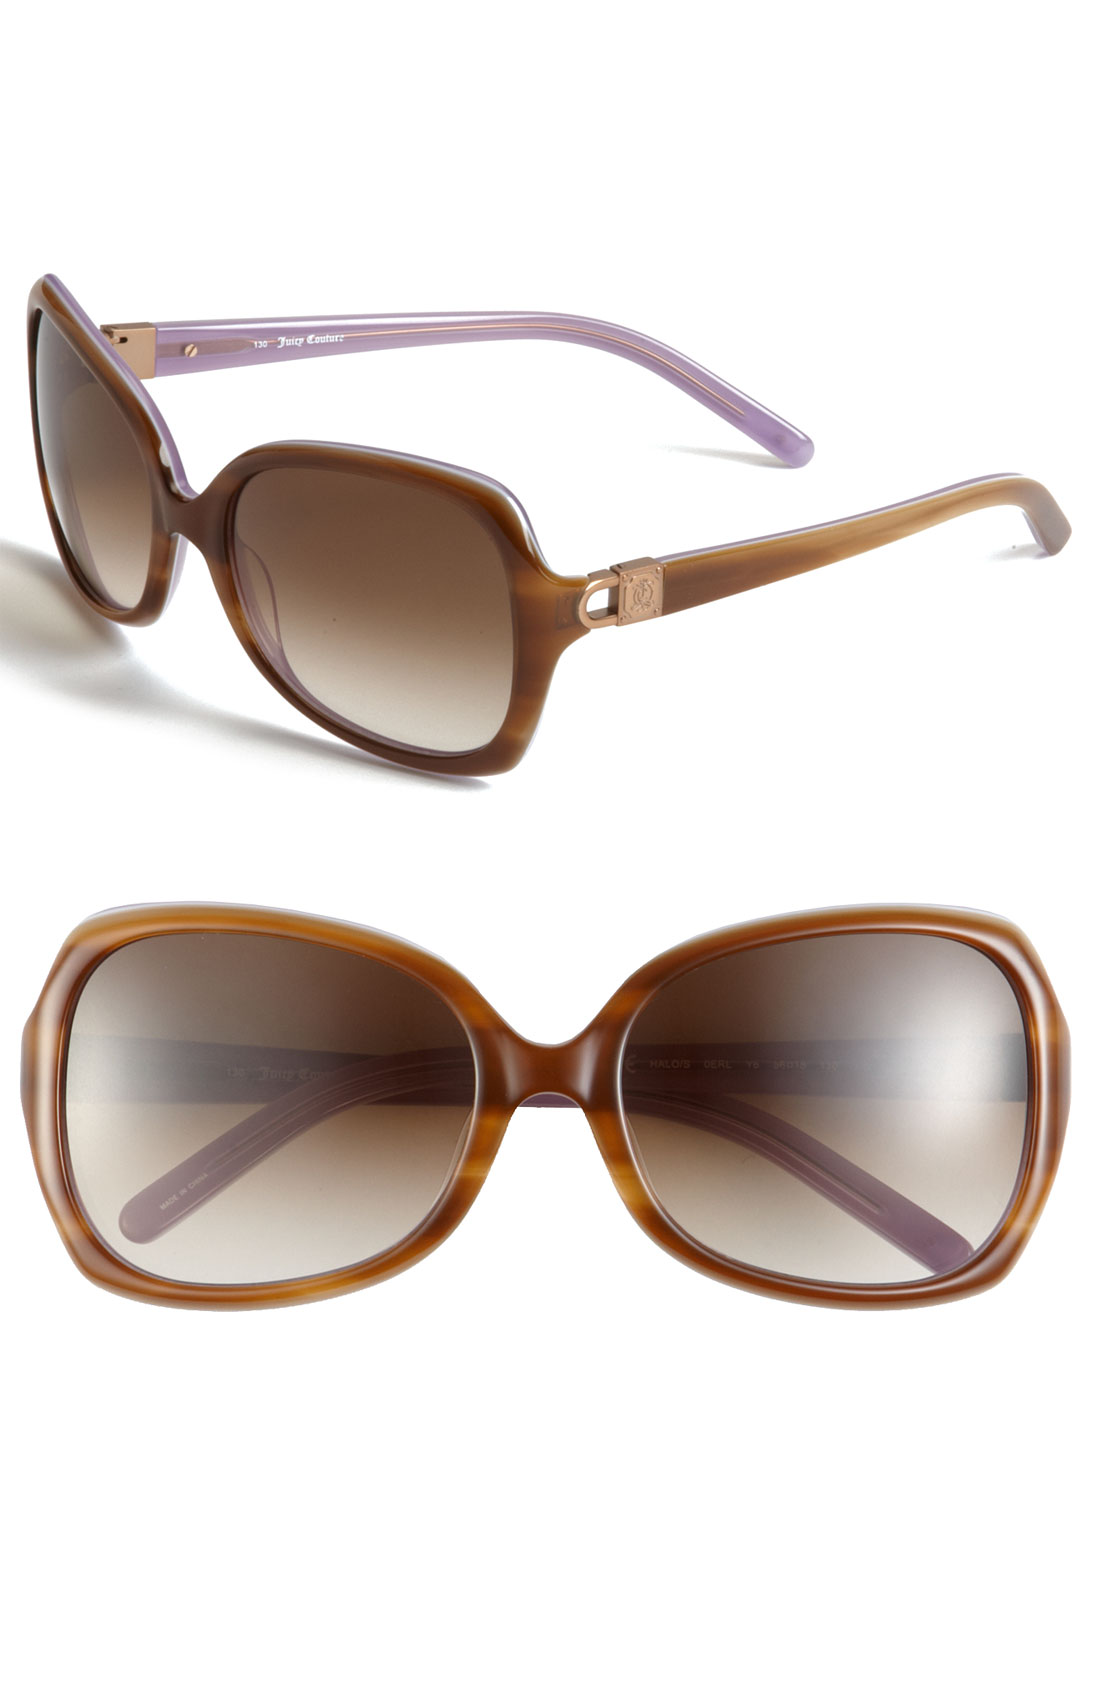 Juicy Couture Square Sunglasses in Purple (blonde lavender ...